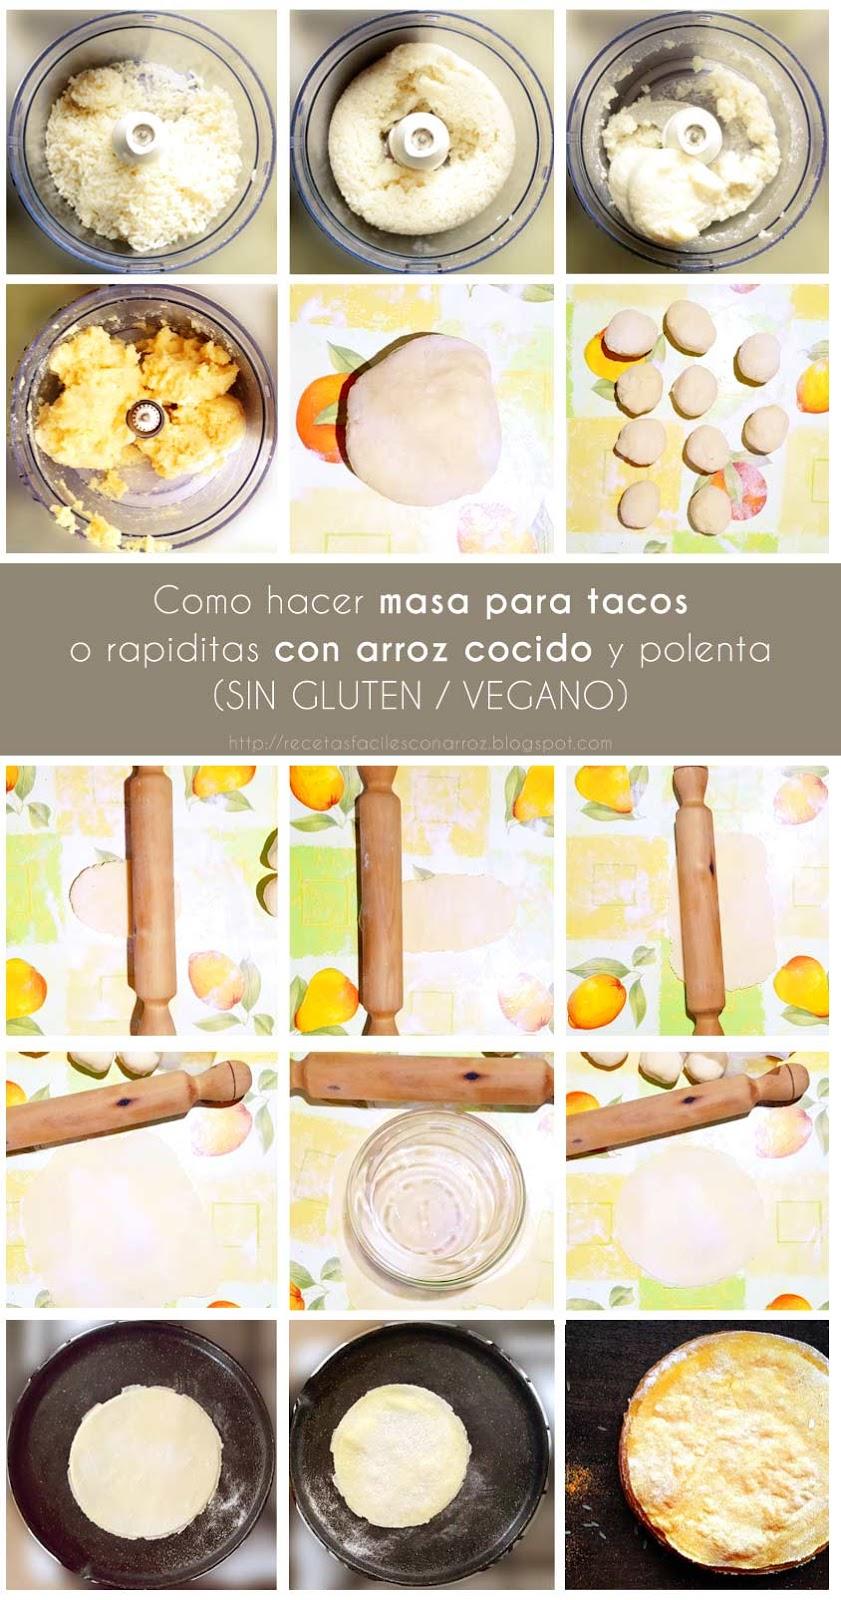 tacos sin gluten fototutorial